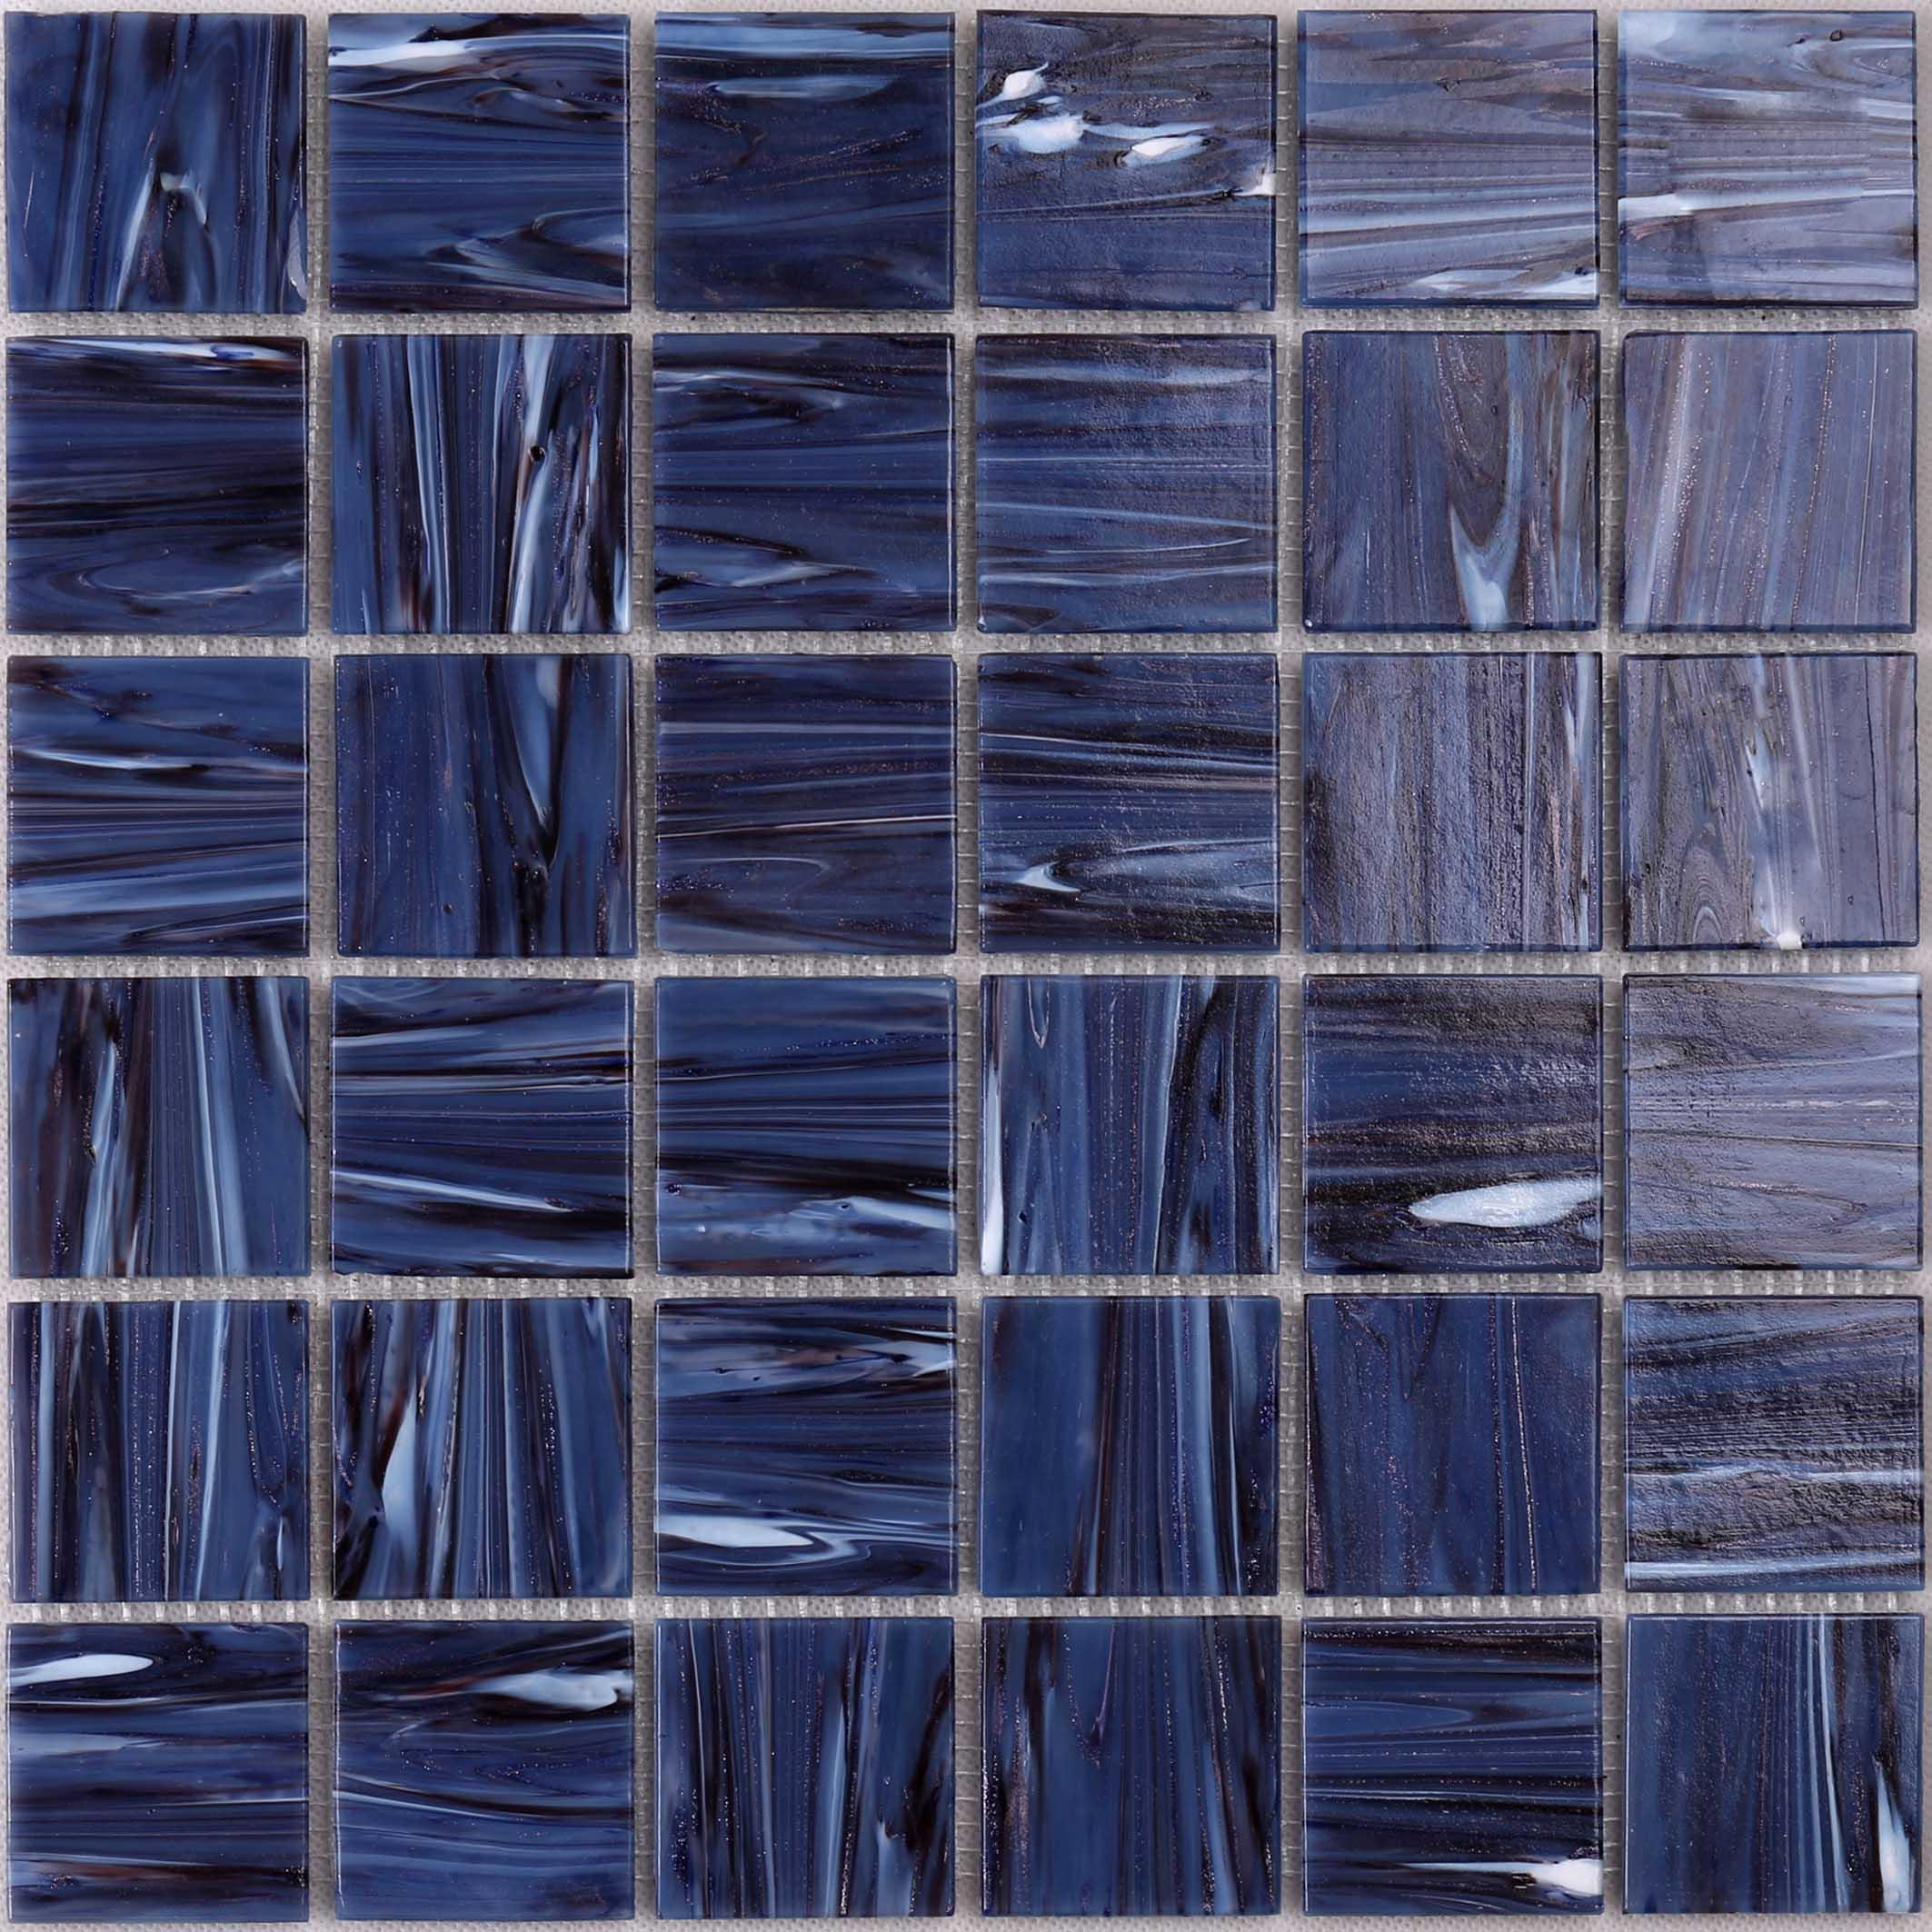 Heng Xing-Oem Swimming Pool Tiles Manufacturer, Pool Tile Suppliers-1